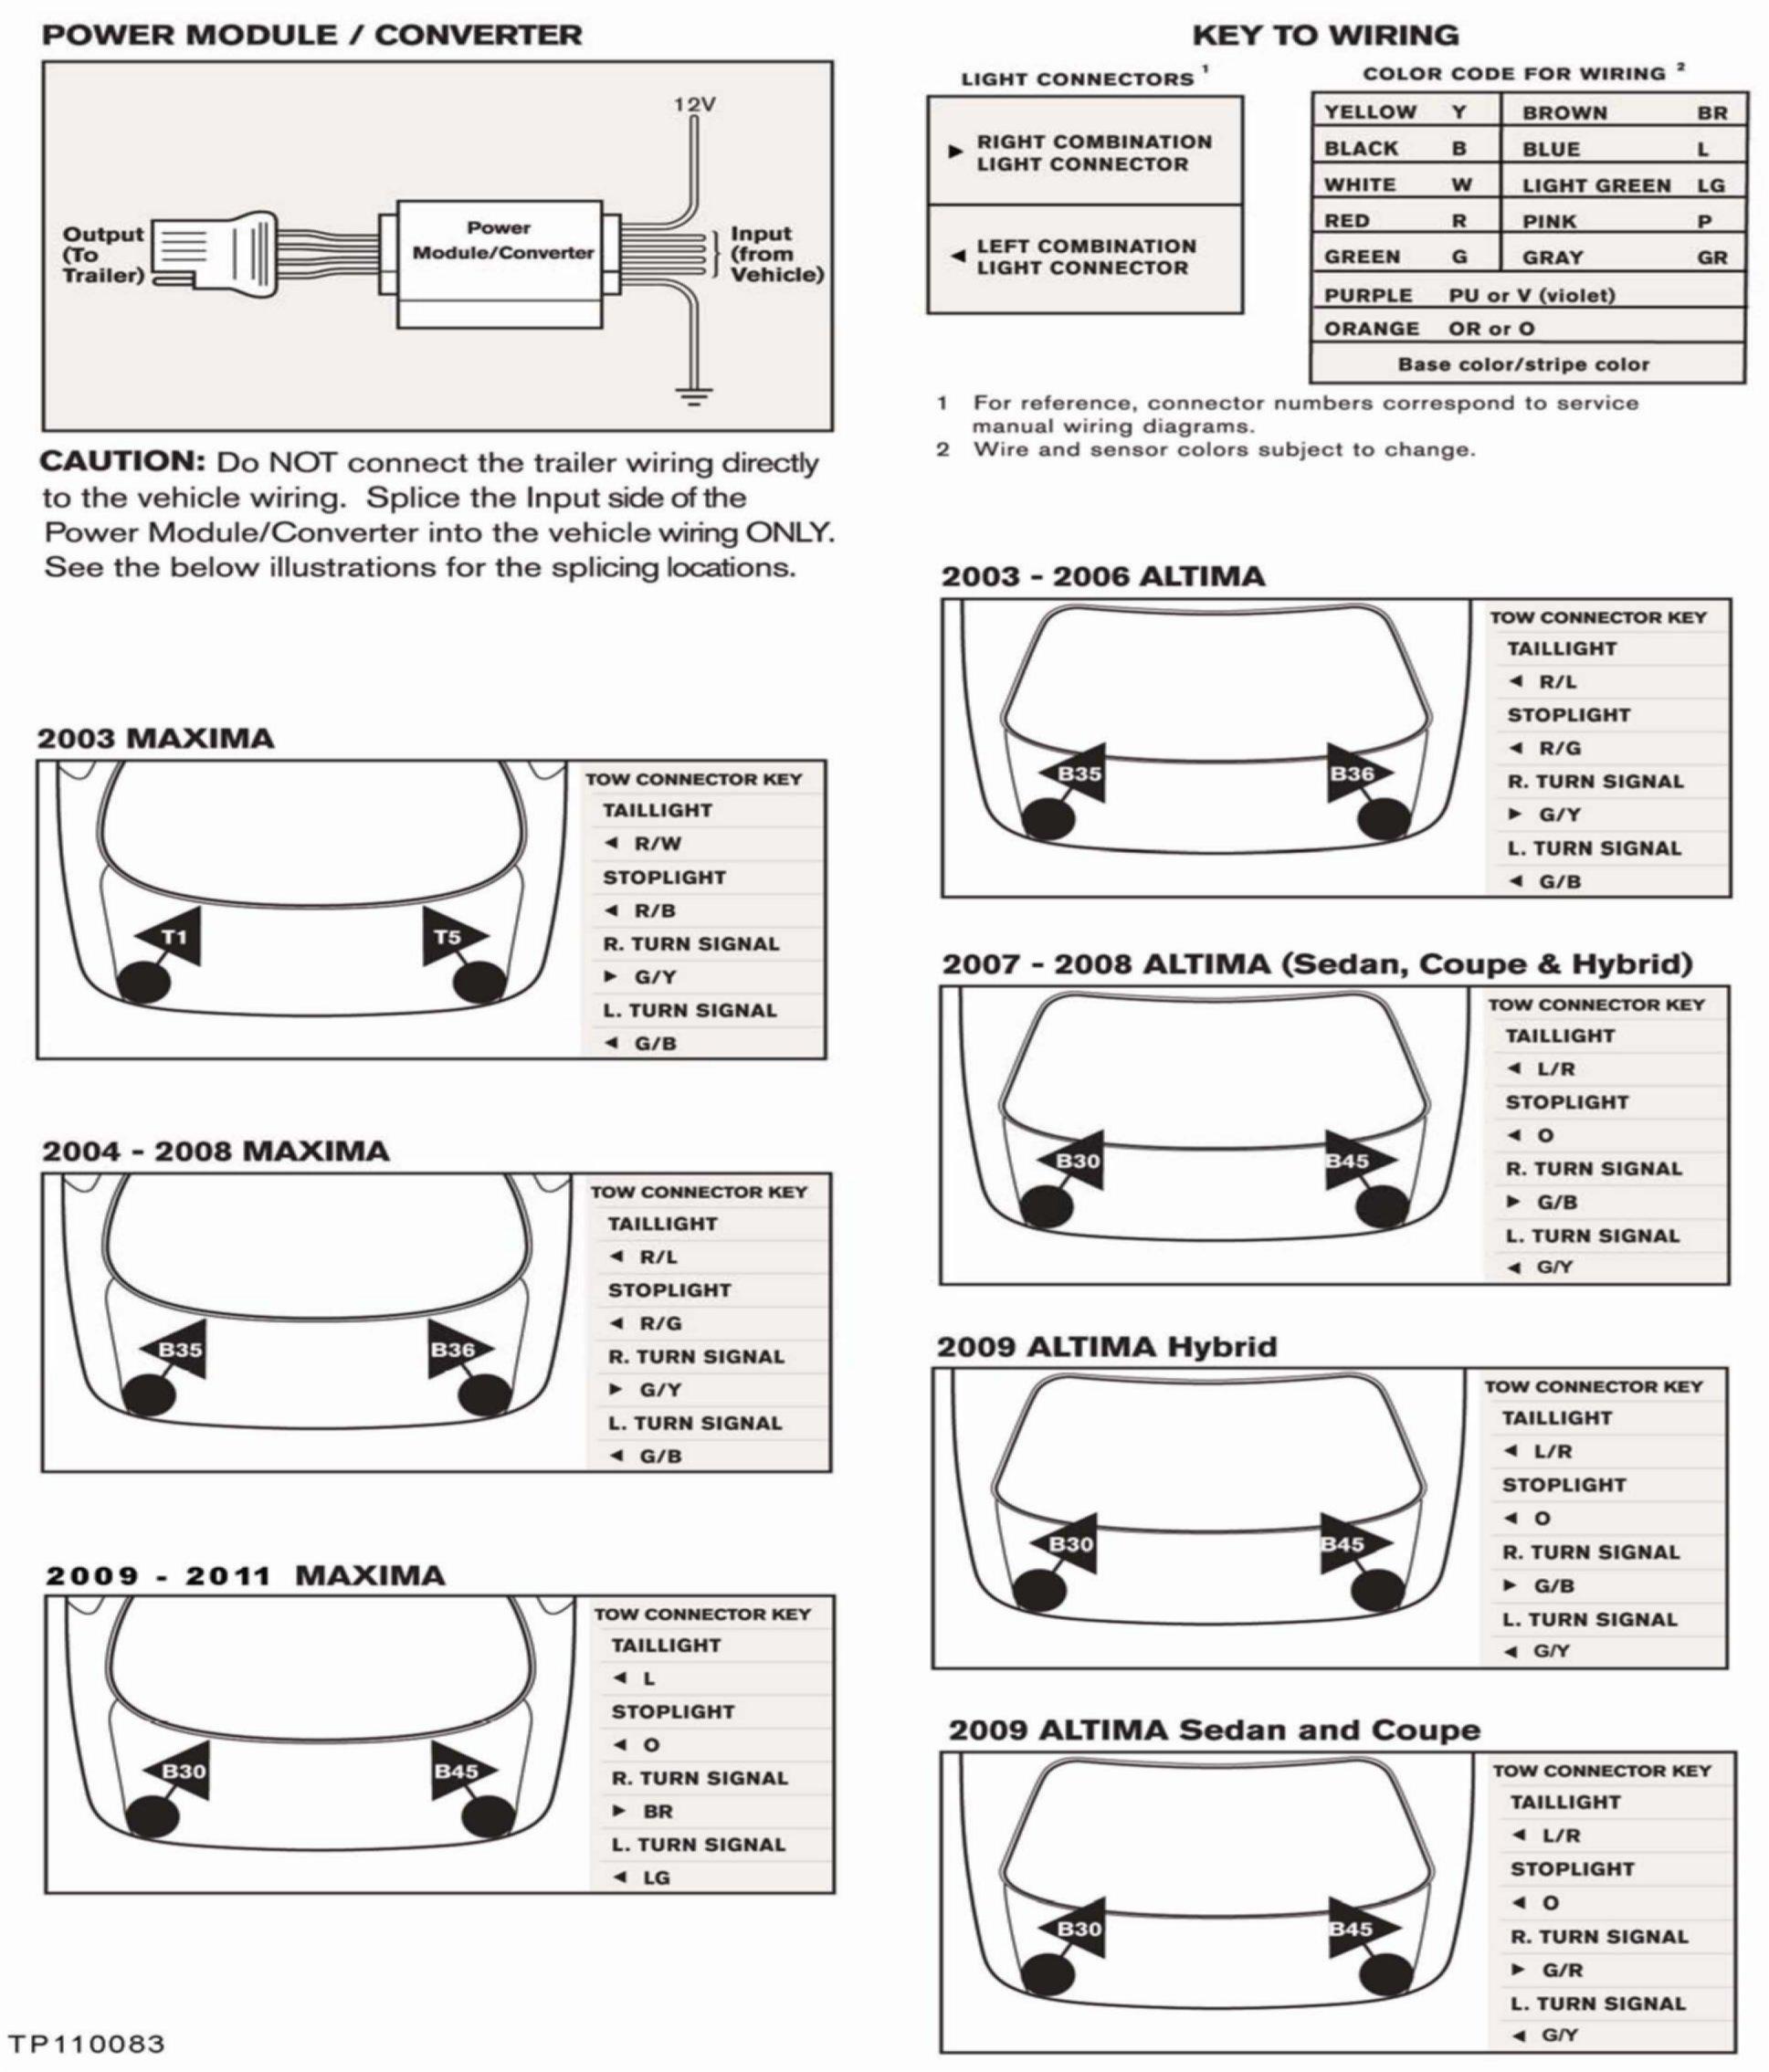 Nissan Altima Trailer Wiring Harness : Alldatadiy nissan datsun altima v l vq de